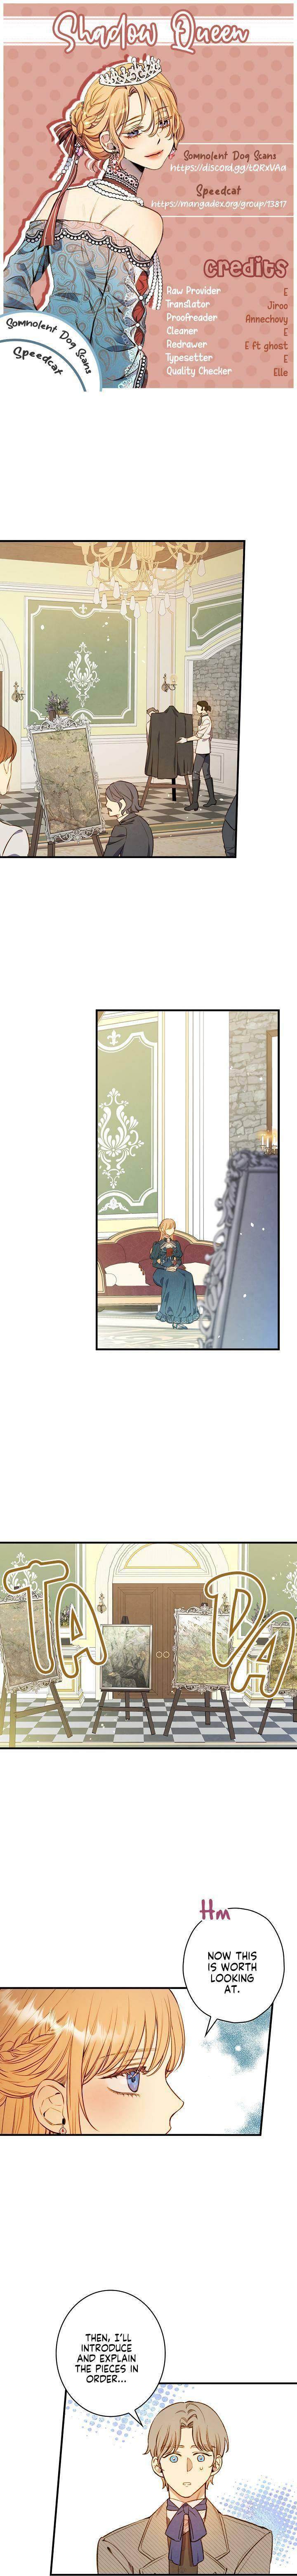 https://manga.mangadogs.com/comics/pic4/14/38798/3268309/0e2894f9e8f5f63f552e7be1eee76cdf.jpg Page 1